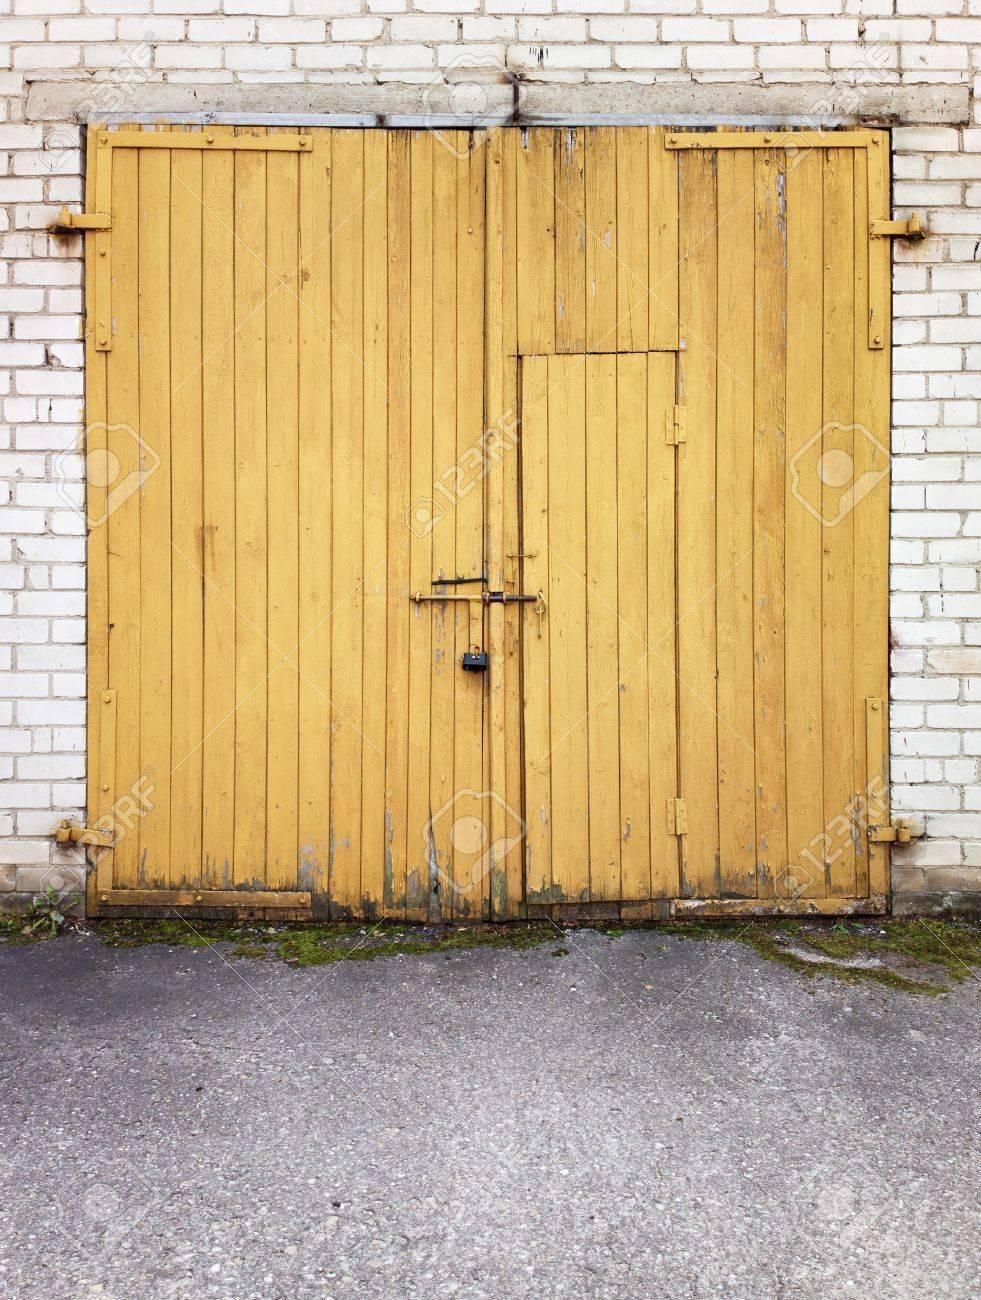 Close yellow garage doors Stock Photo - 14517616